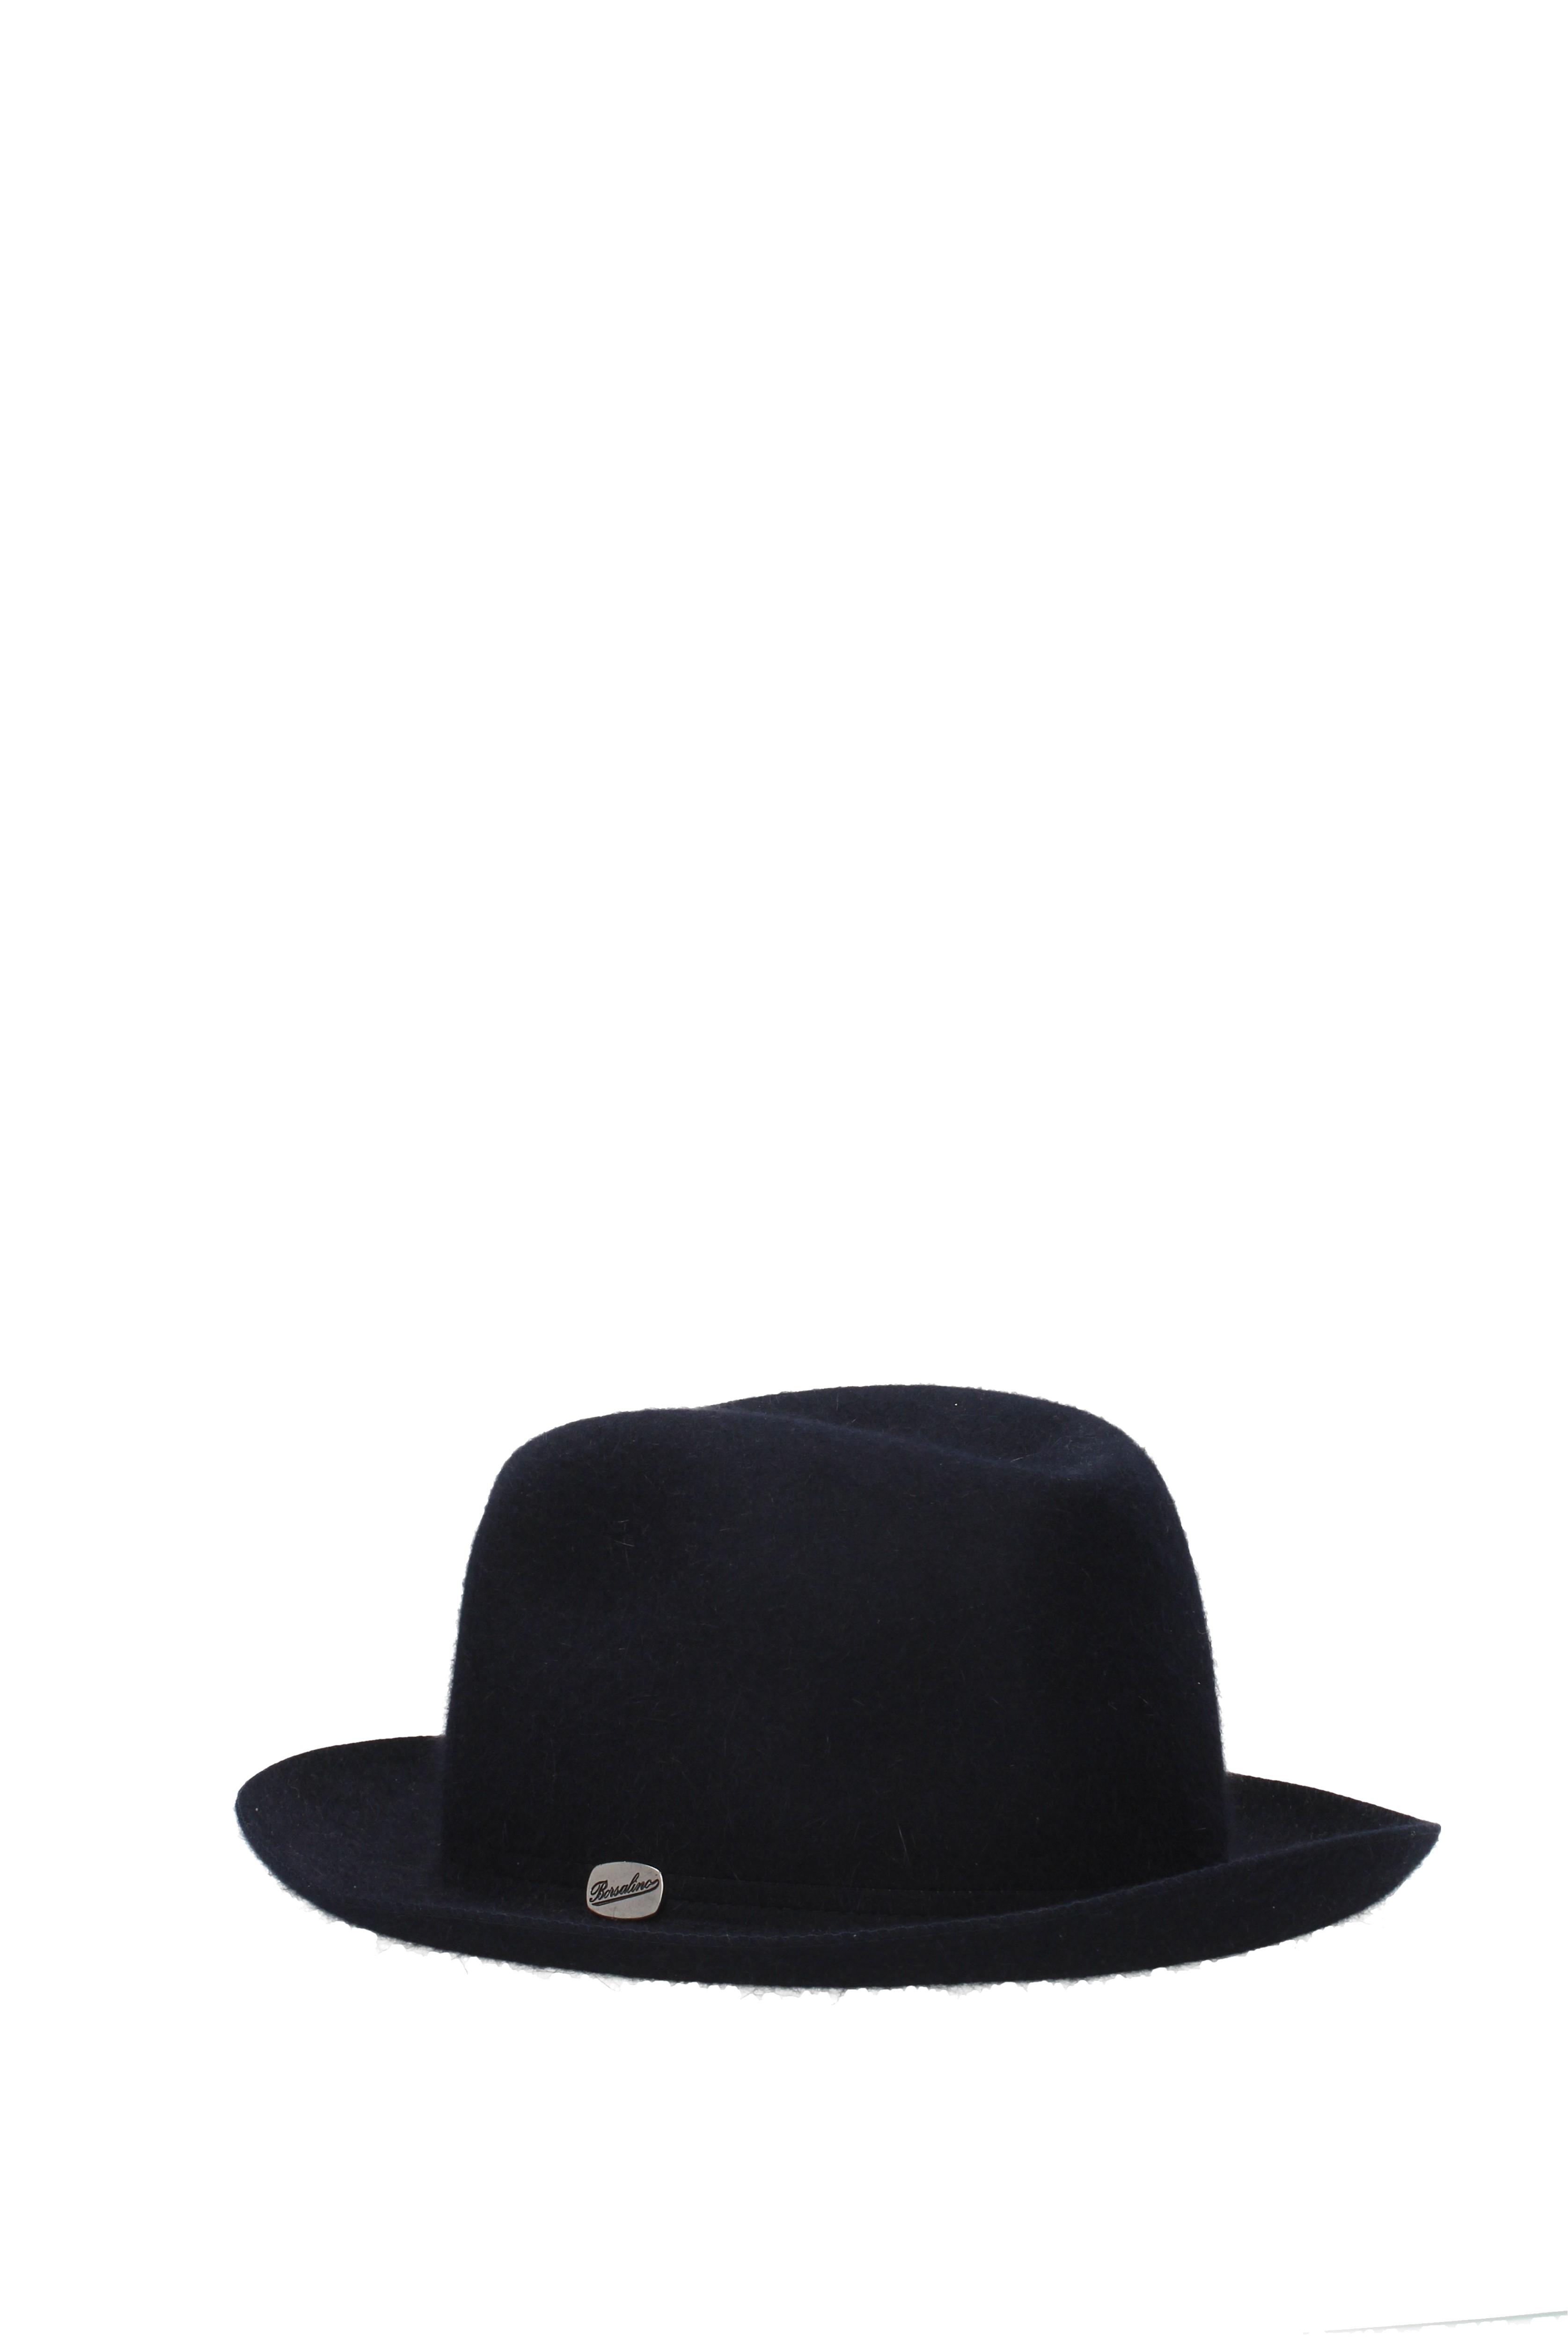 Cappelli Borsalino Uomo - Feltro (150228)  7181456180c3